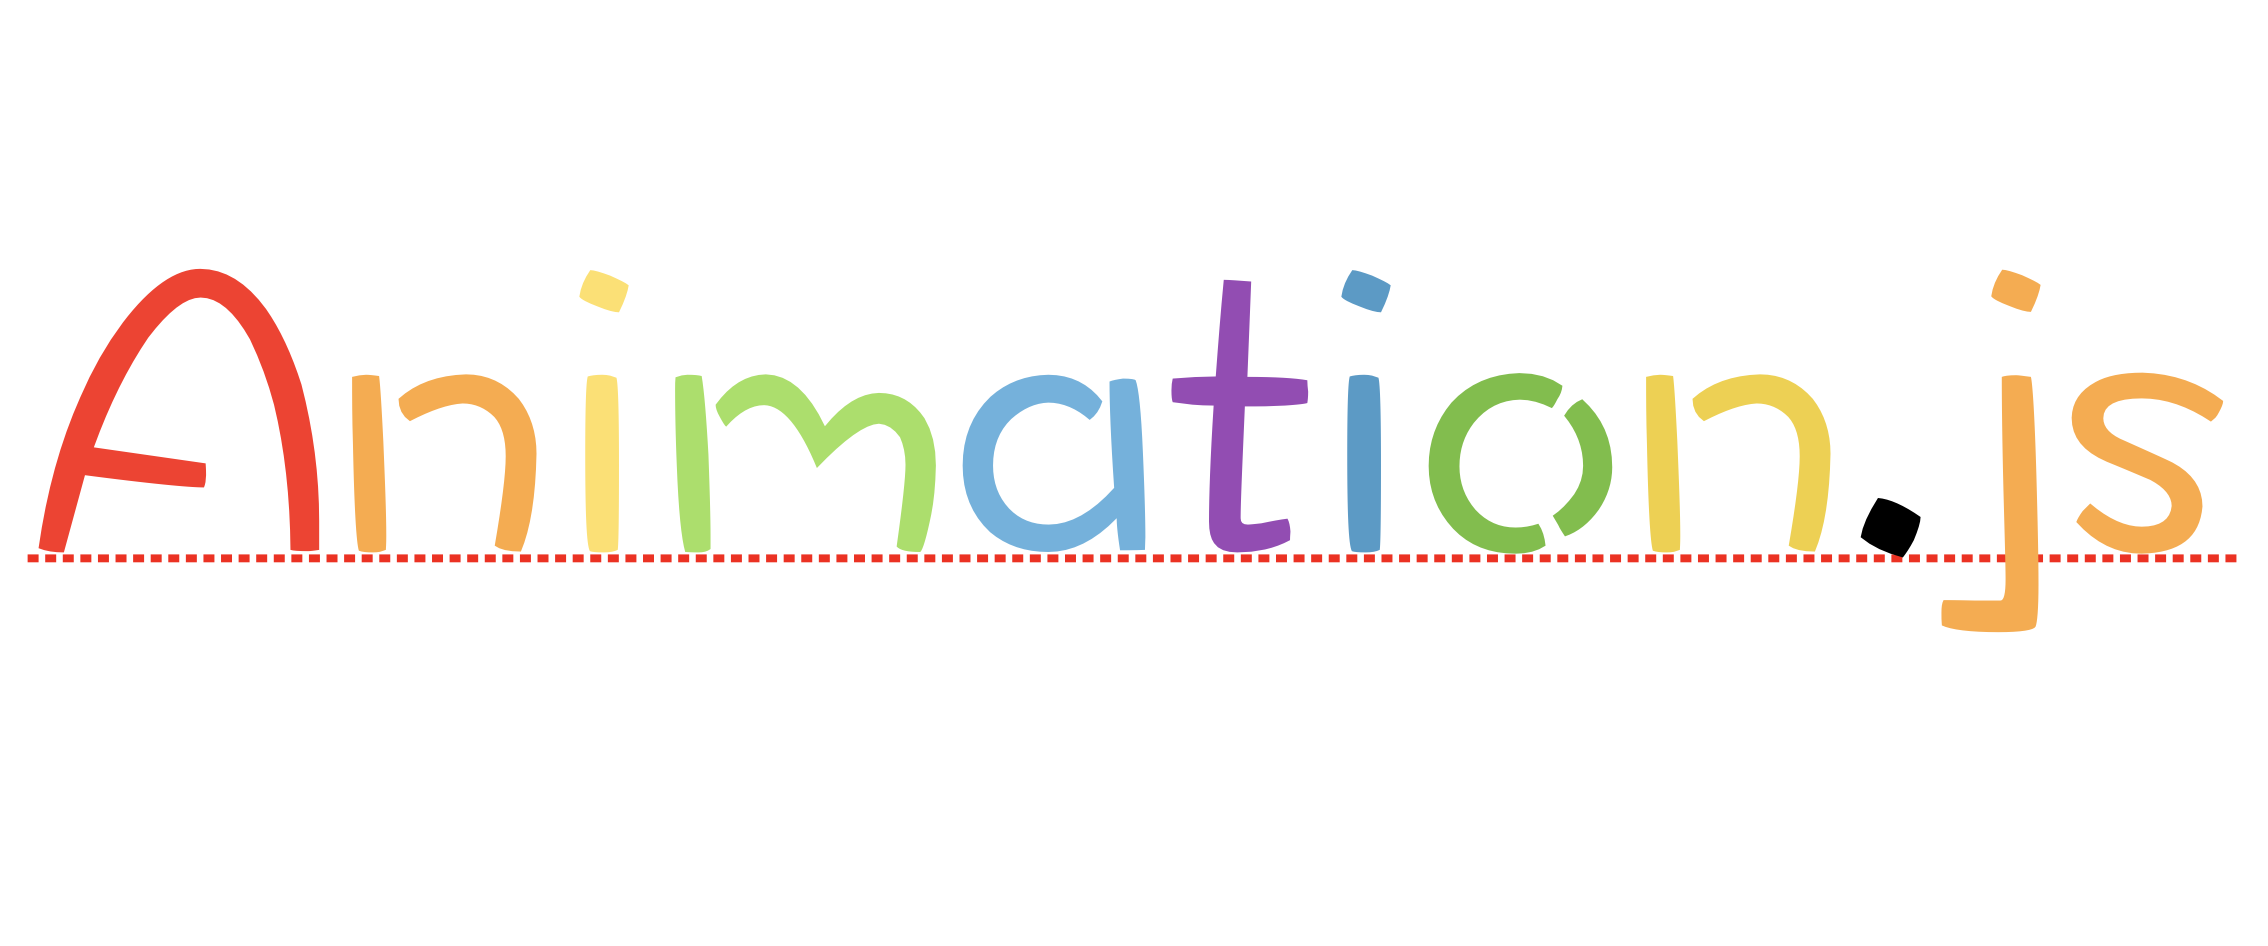 Animation.js